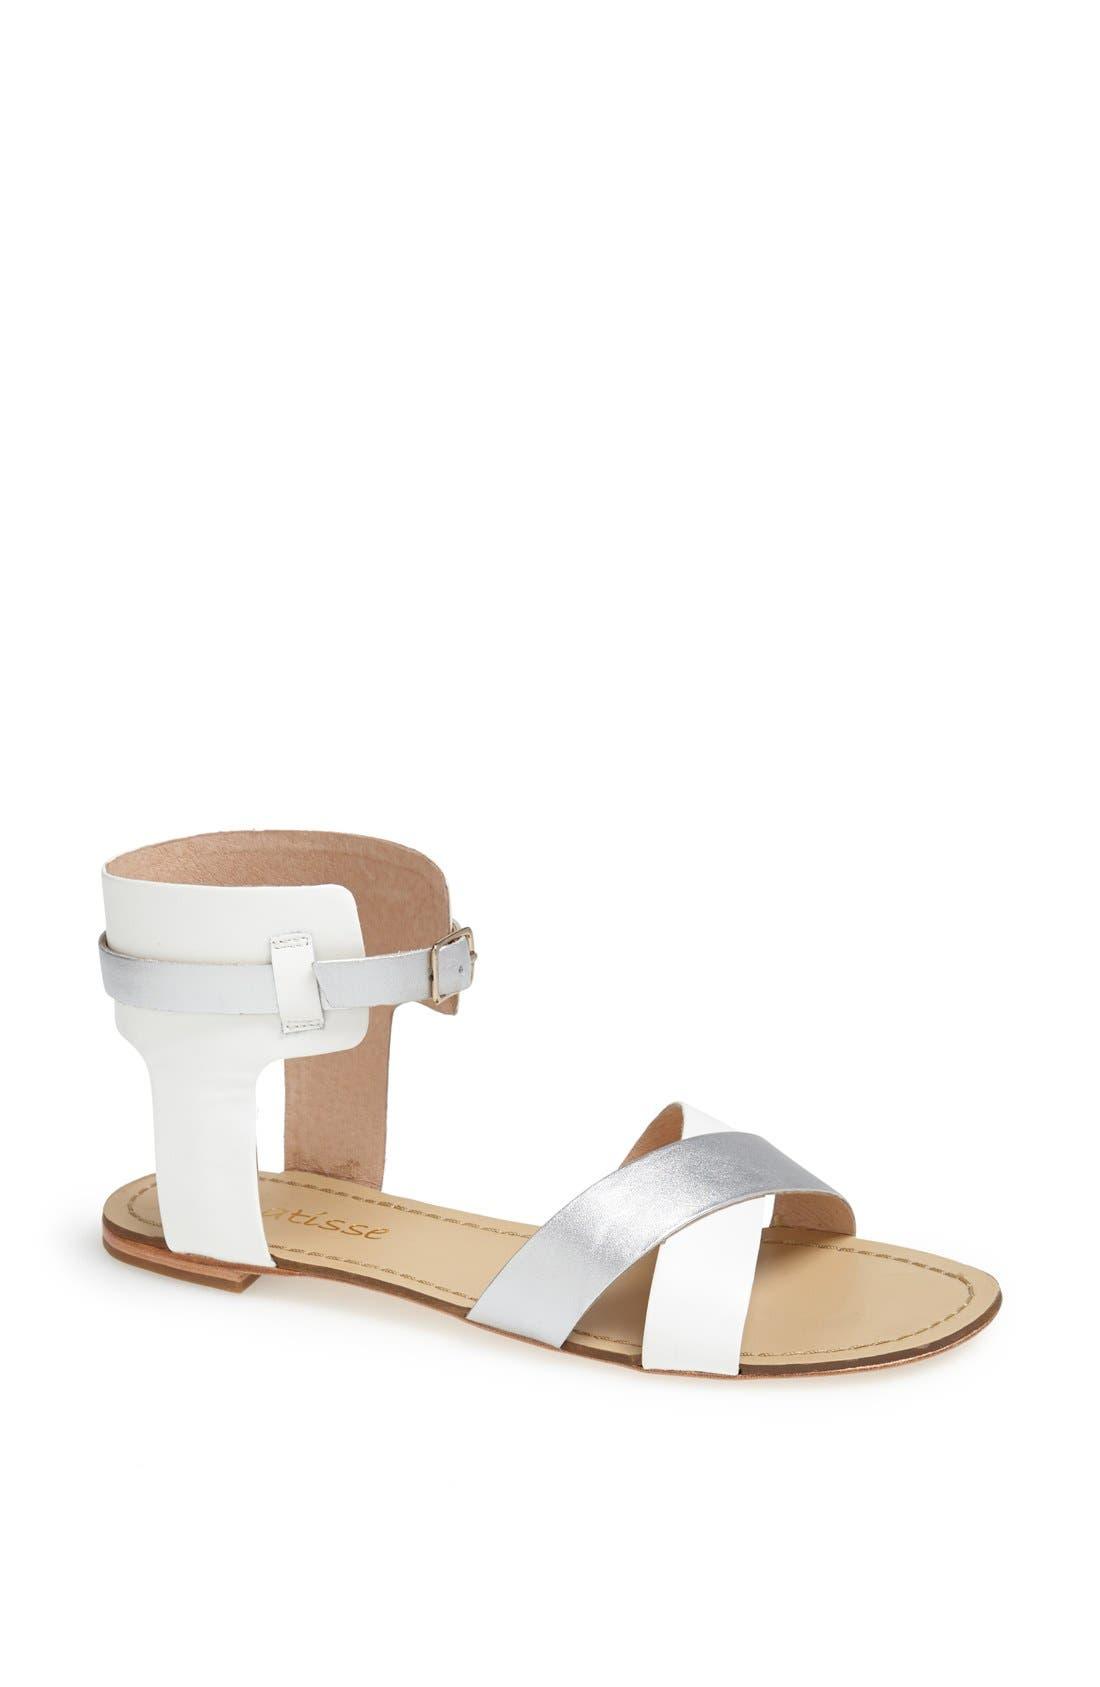 Alternate Image 1 Selected - Matisse 'Jacob' Sandal